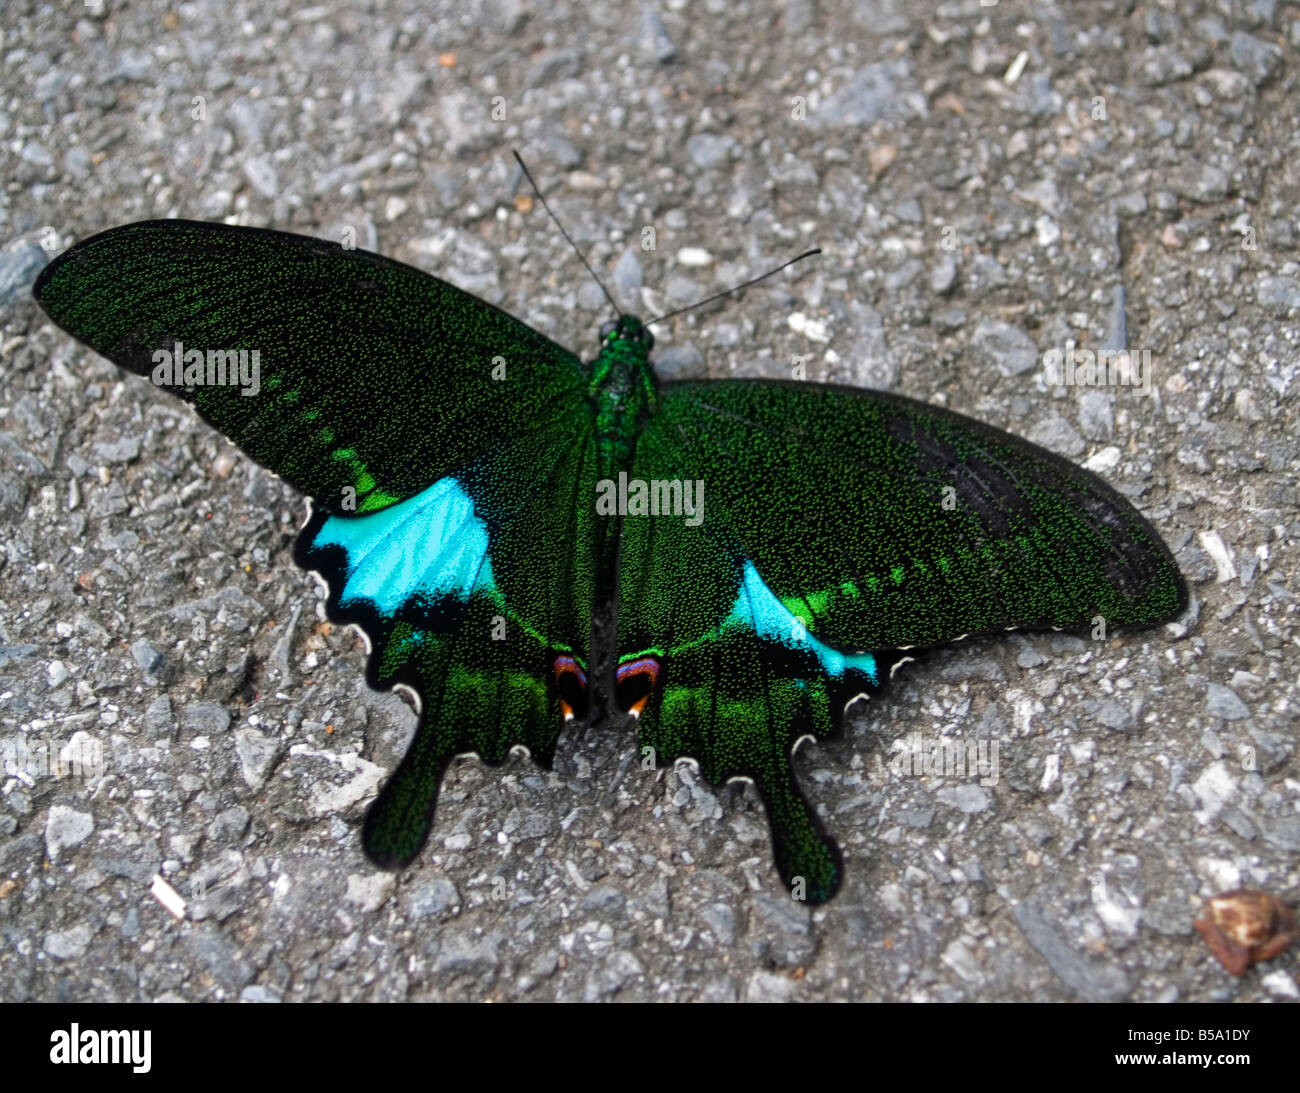 paris peacock butterfly in Khao Yai National Park Thailand Stock Photo